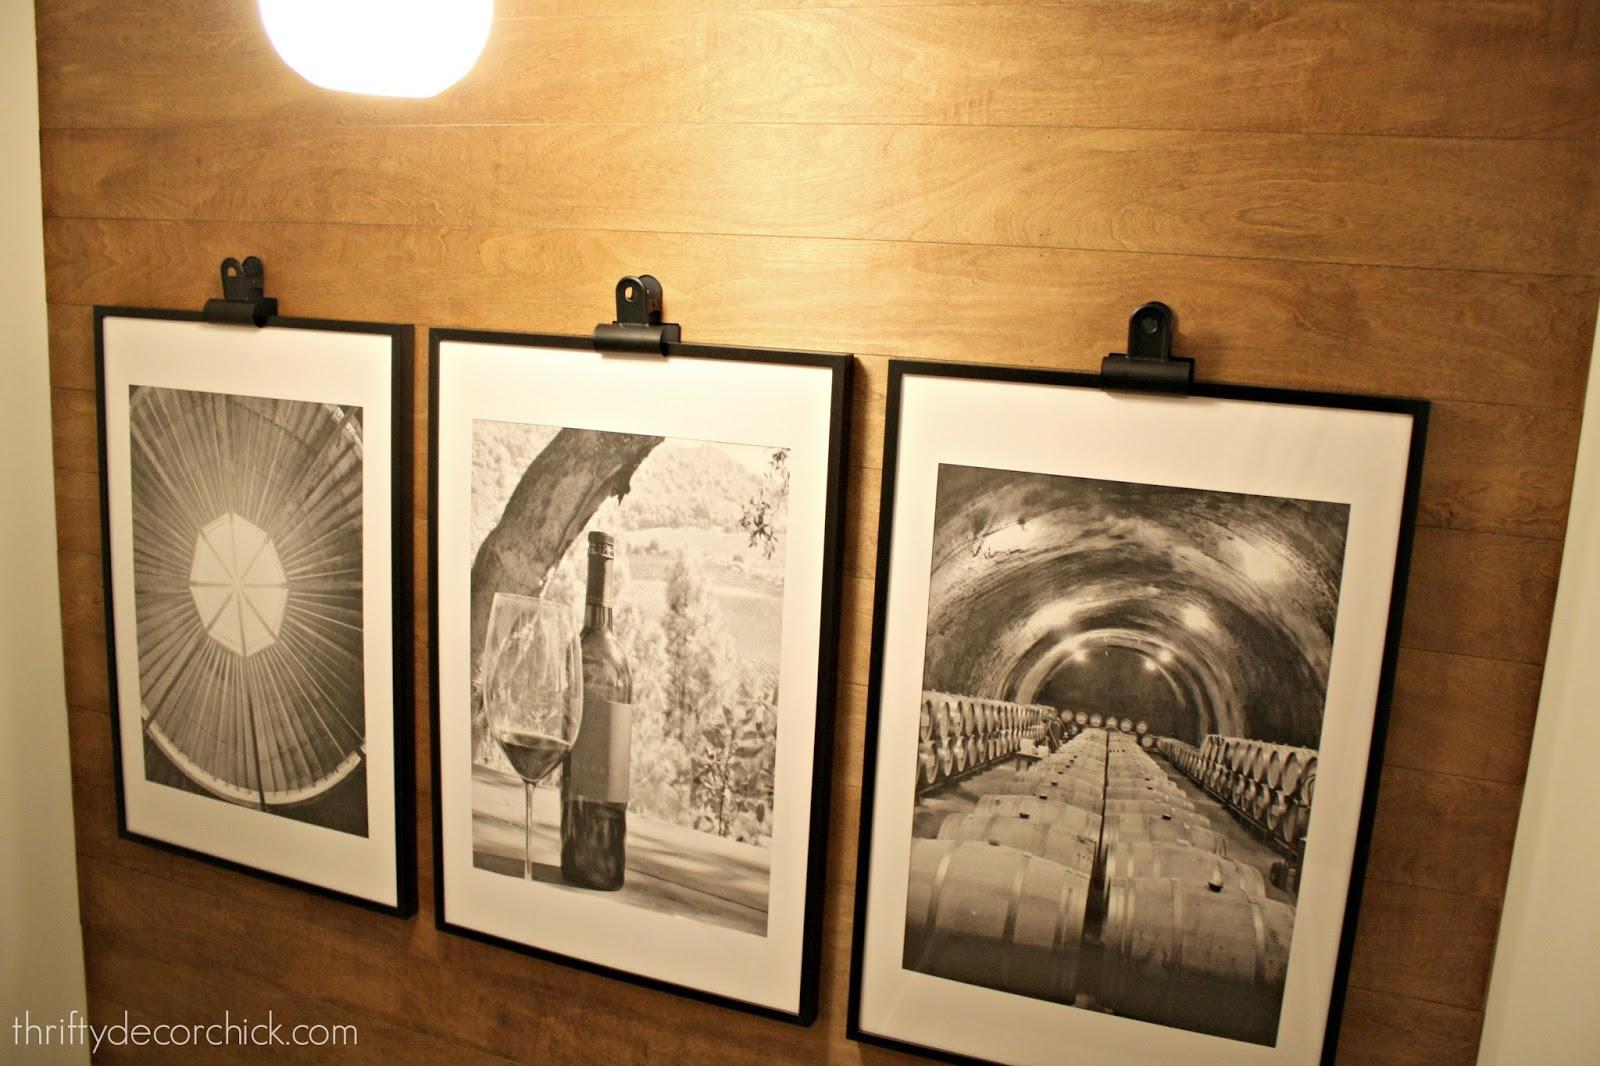 Blueprint prints from Staples